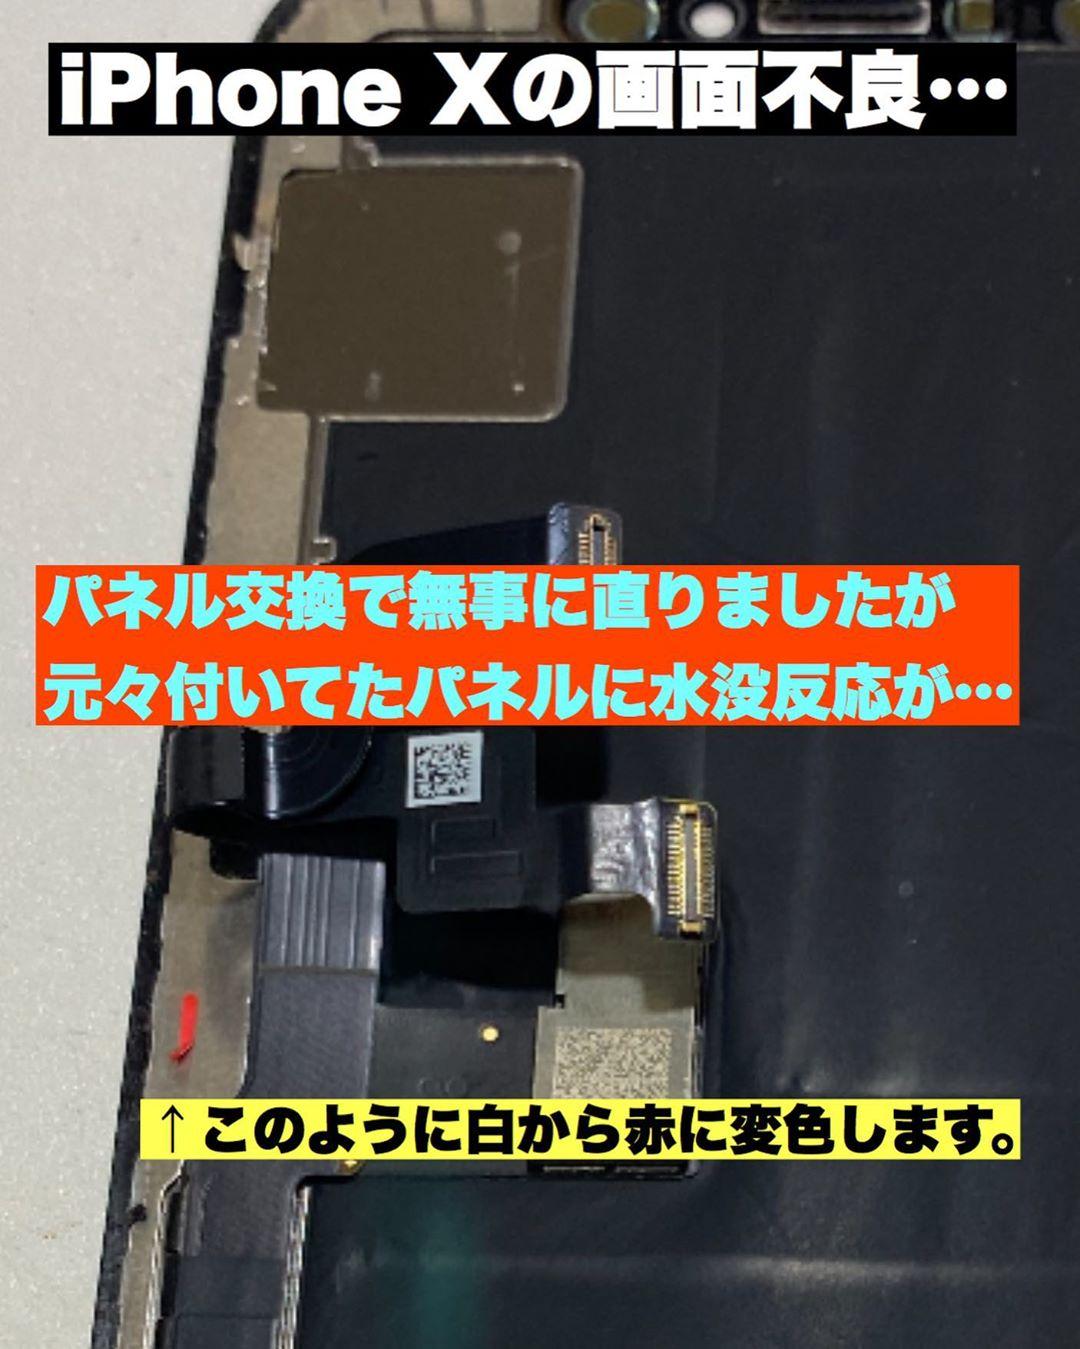 iPhoneX 画面不良 パネル交換 ヴィジョン江南駅前店